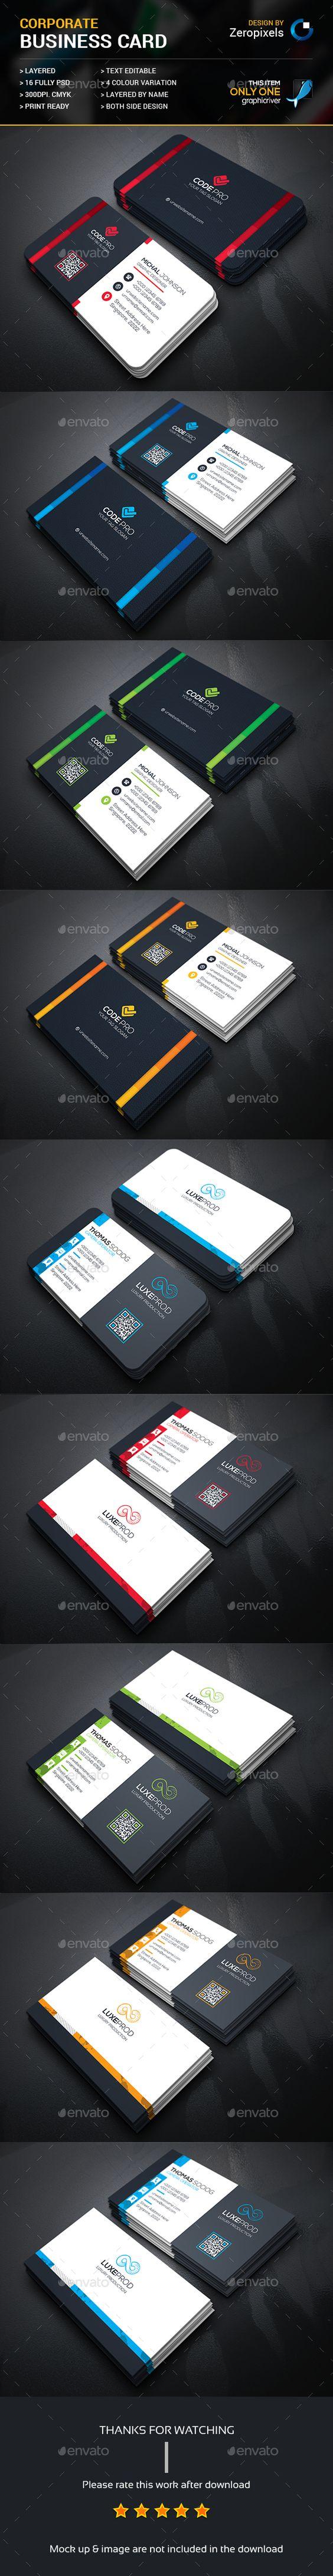 Generous Body Shop Business Cards Photos - Business Card Ideas ...